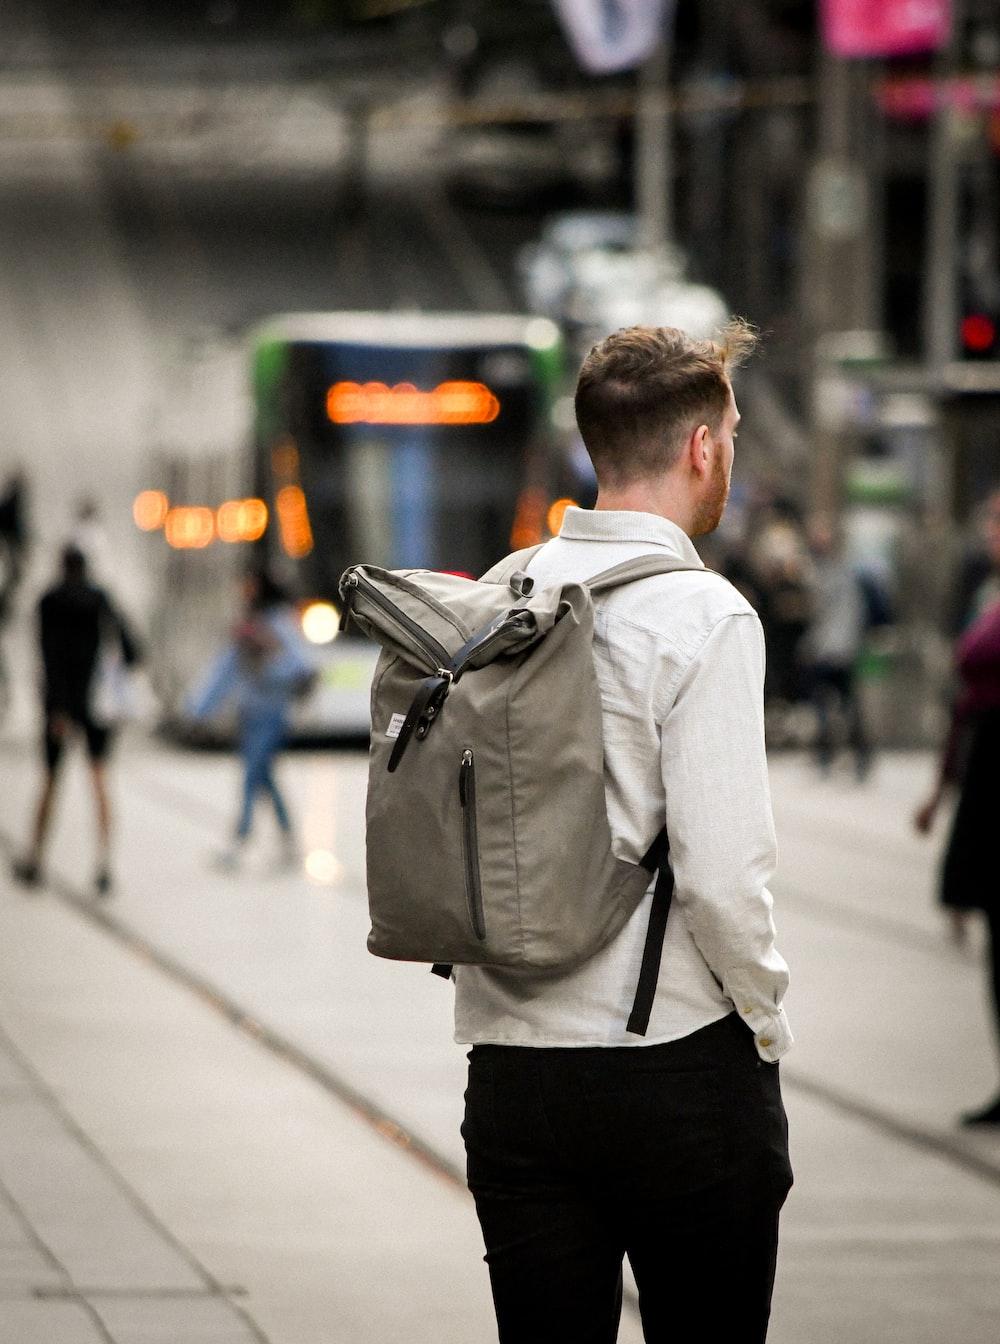 man in white dress shirt and black pants carrying black backpack walking on sidewalk during daytime